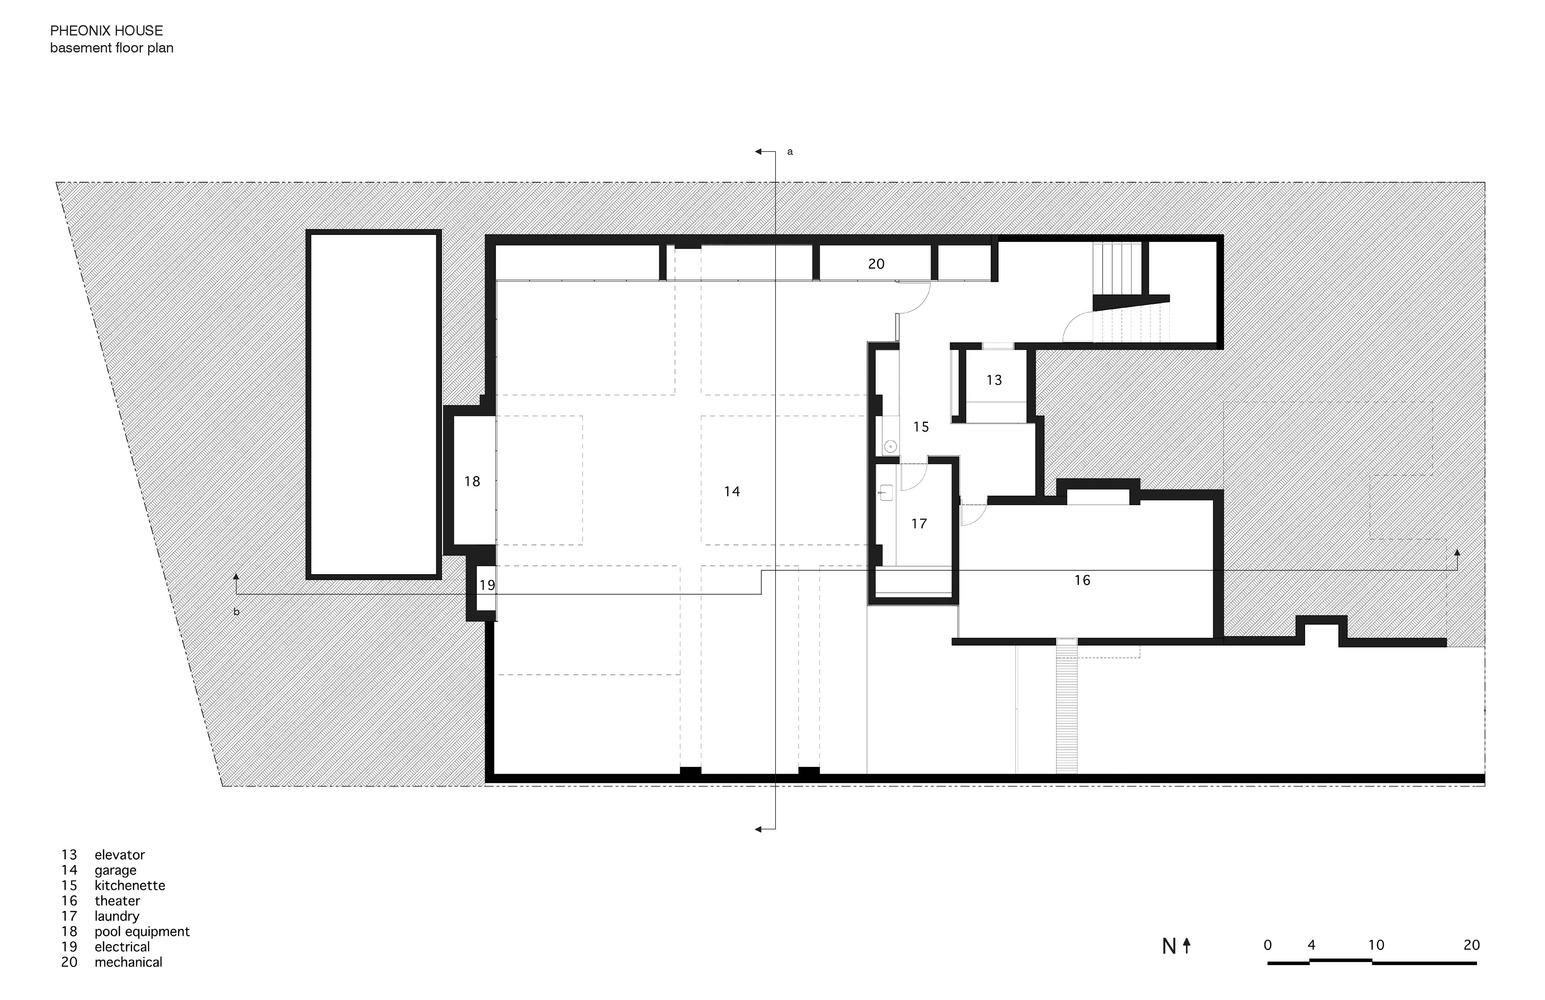 phoenix house sebastian mariscal studio basement plan [ 1545 x 1000 Pixel ]